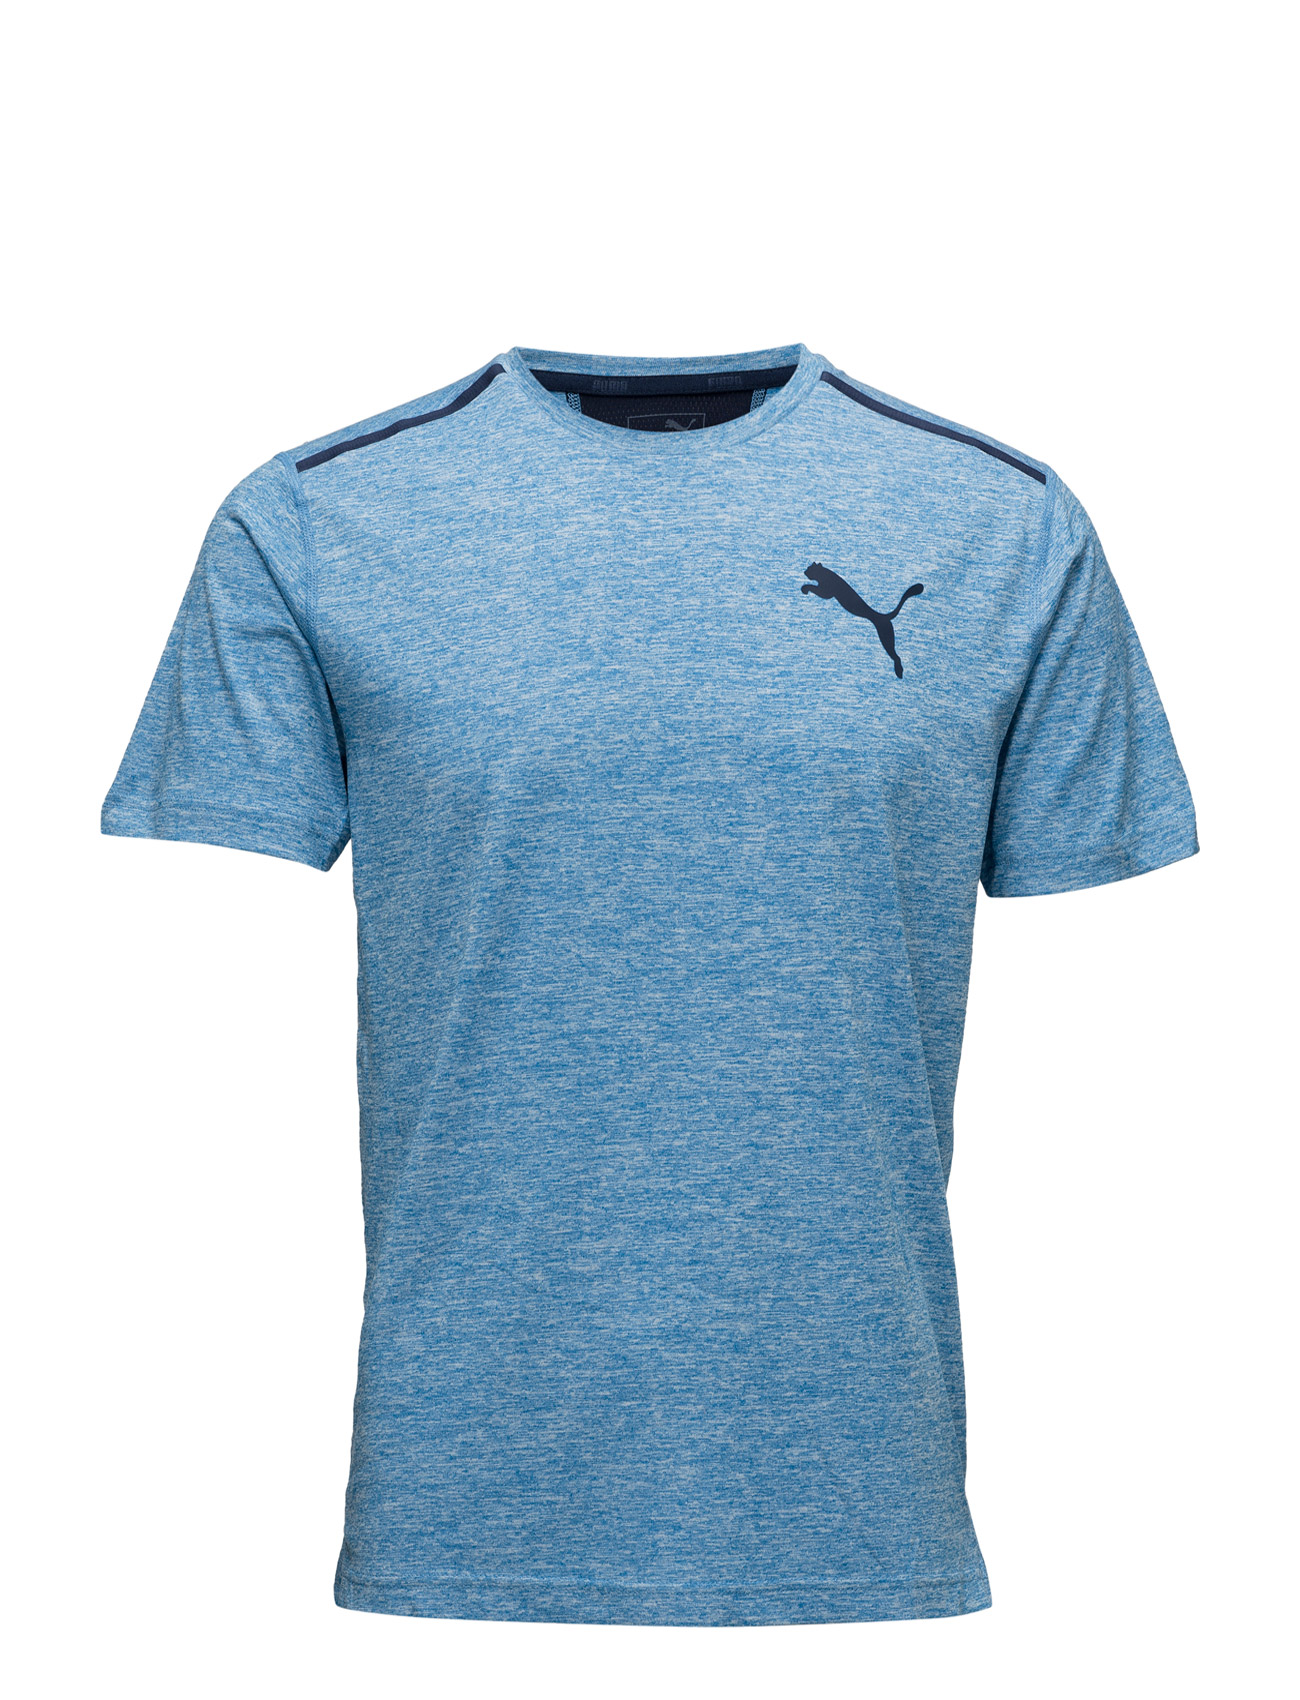 Bonded Tech Ss Tee PUMA SPORT Løbe t-shirts til Mænd i